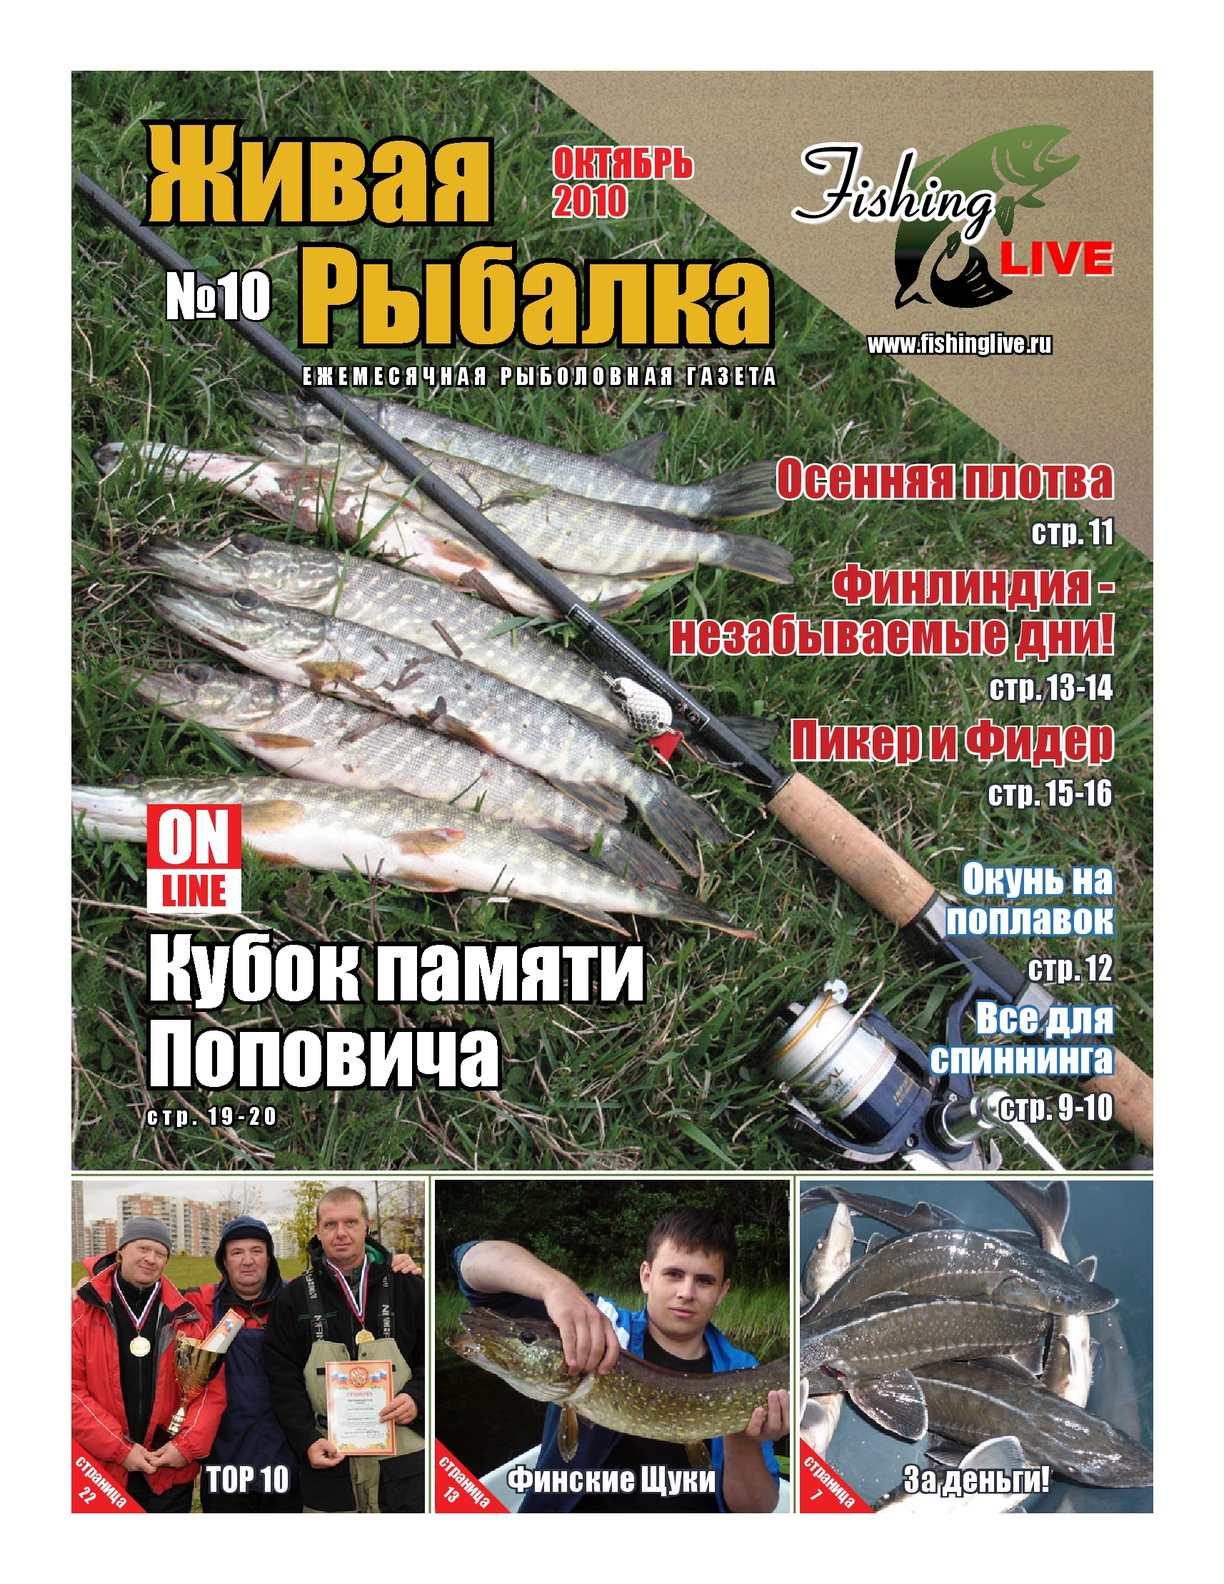 журналы о рыбалке и цены на них